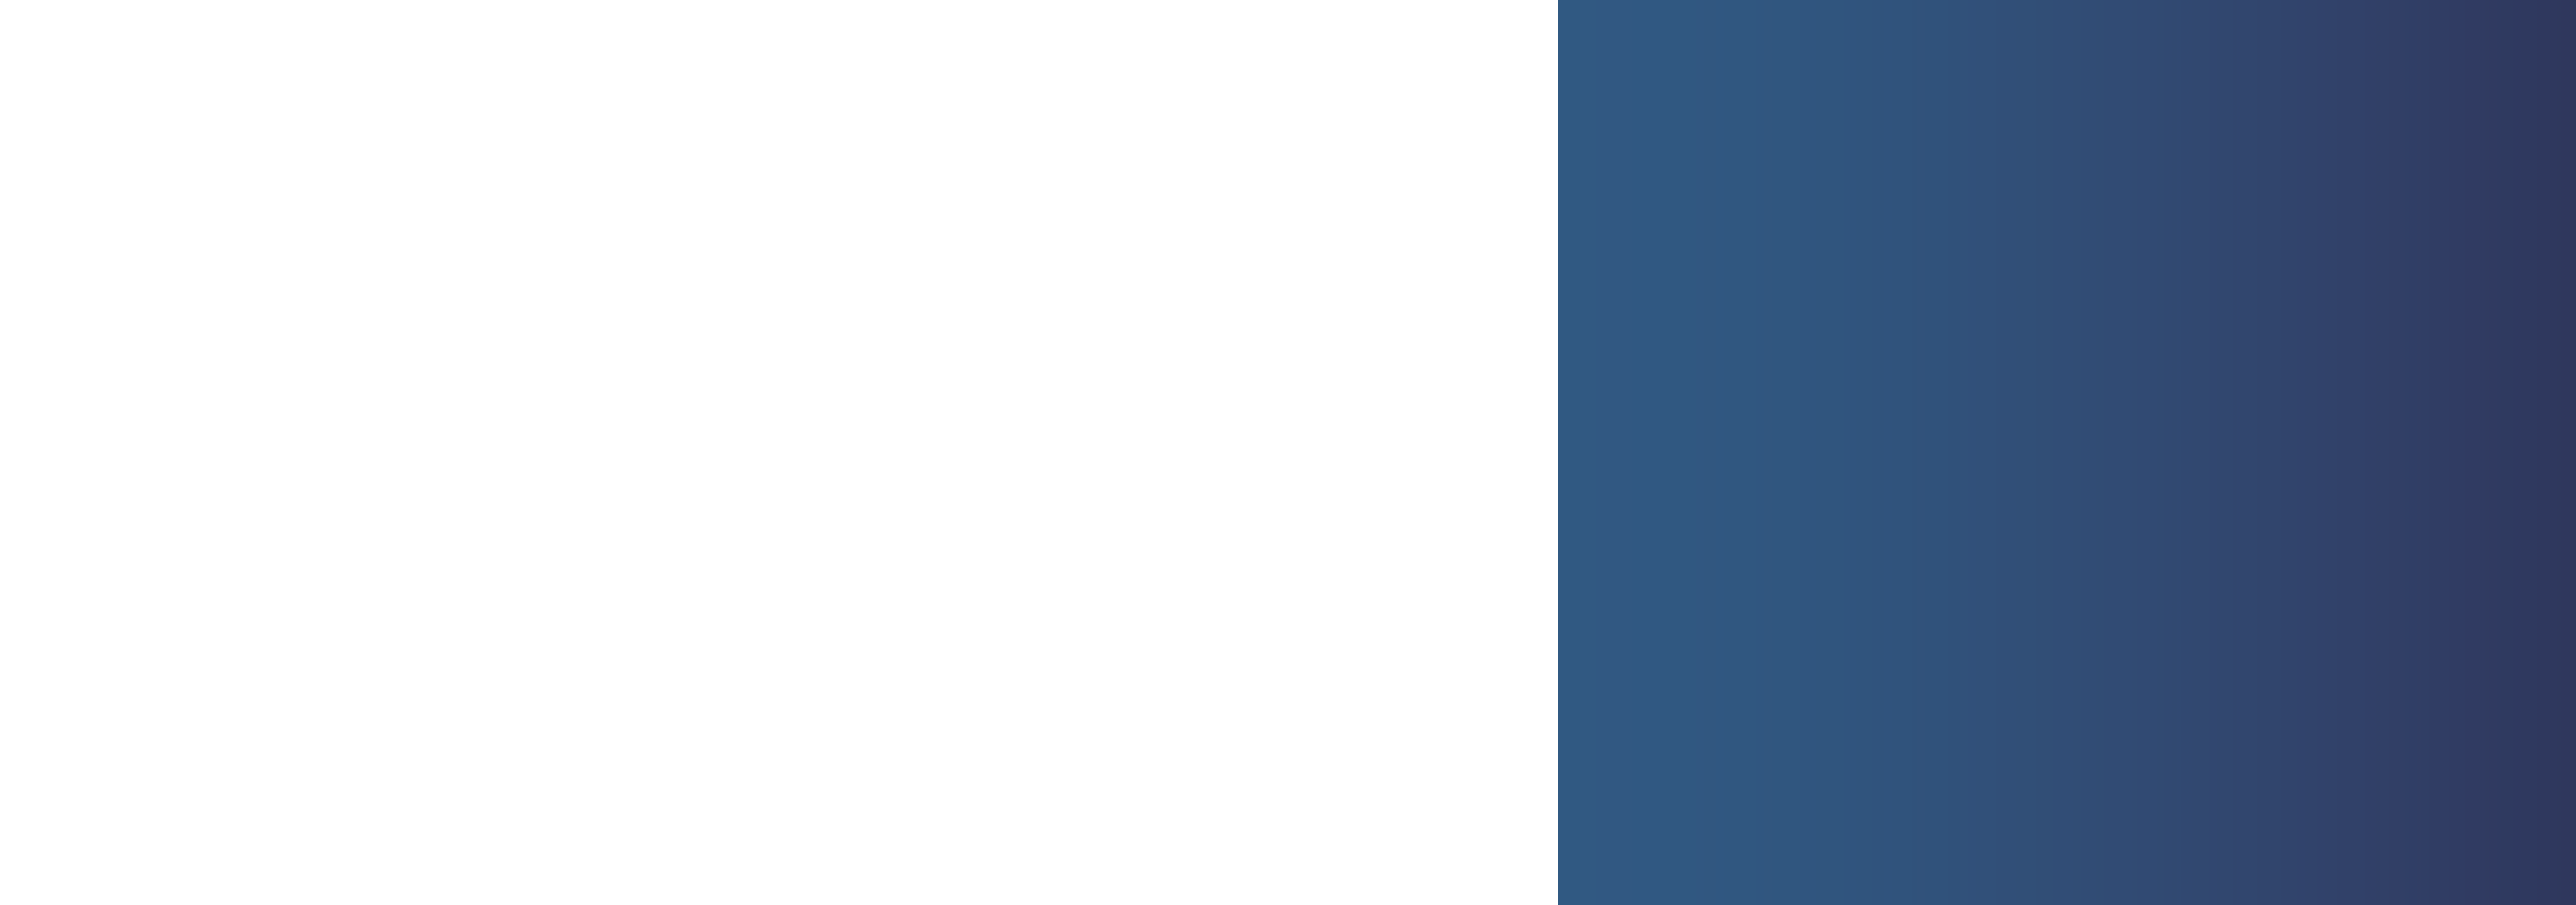 Banner-Blue